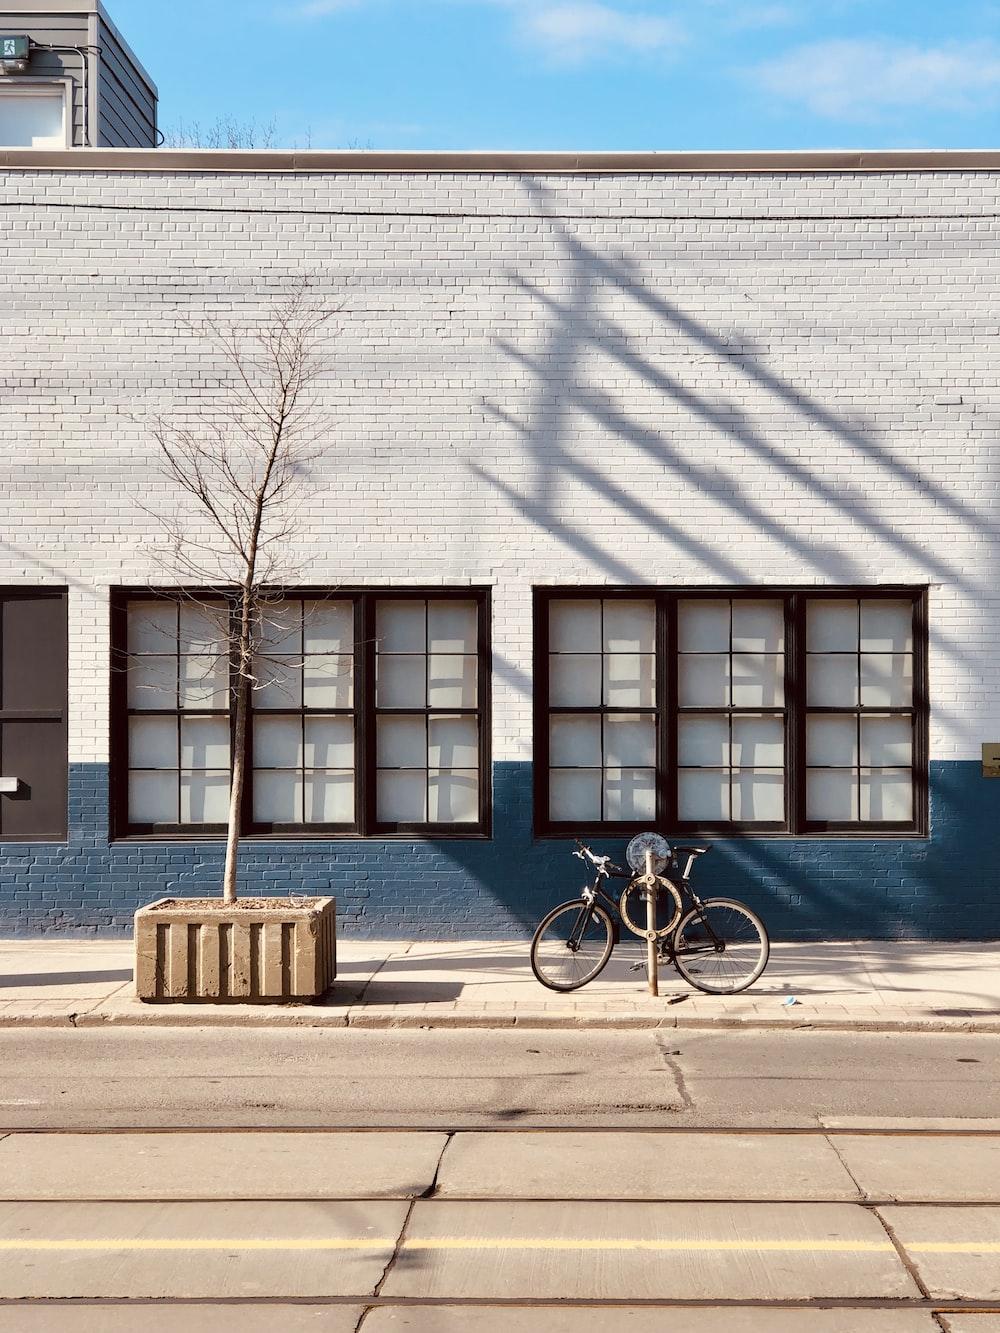 black bicycle parked beside blue concrete building